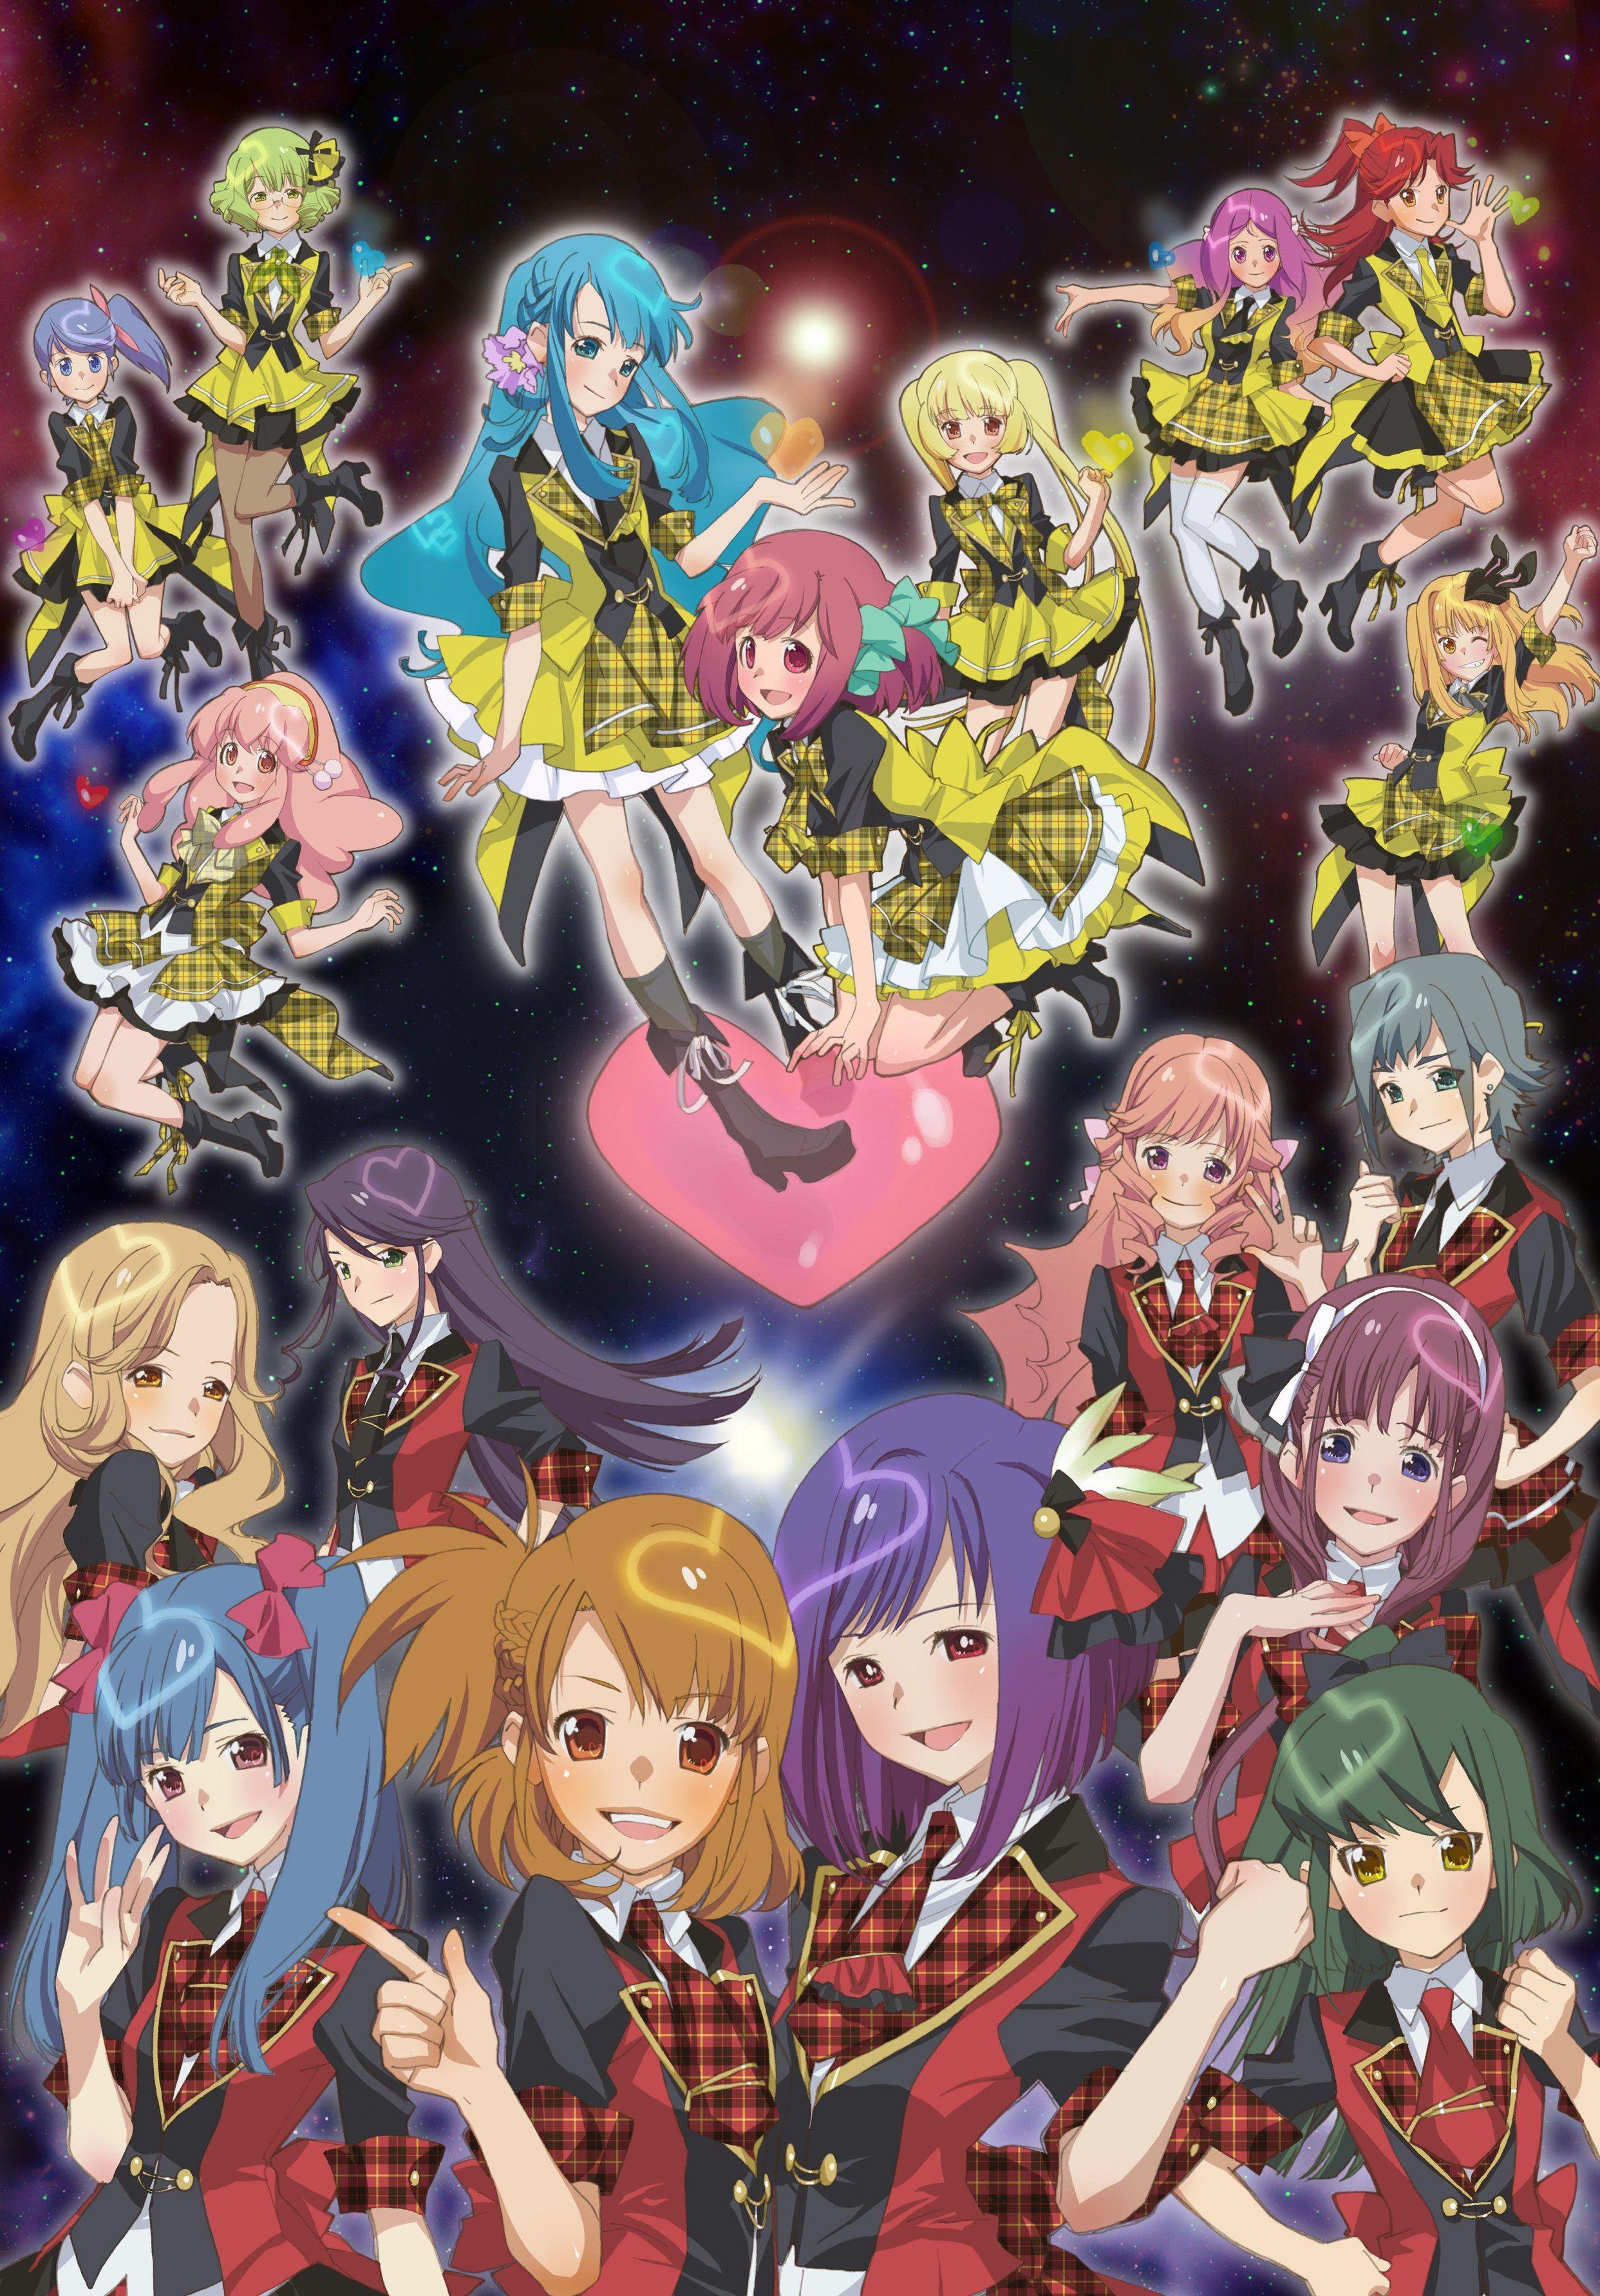 AKB 0048 #anime #manga #girls #shoujo #cute